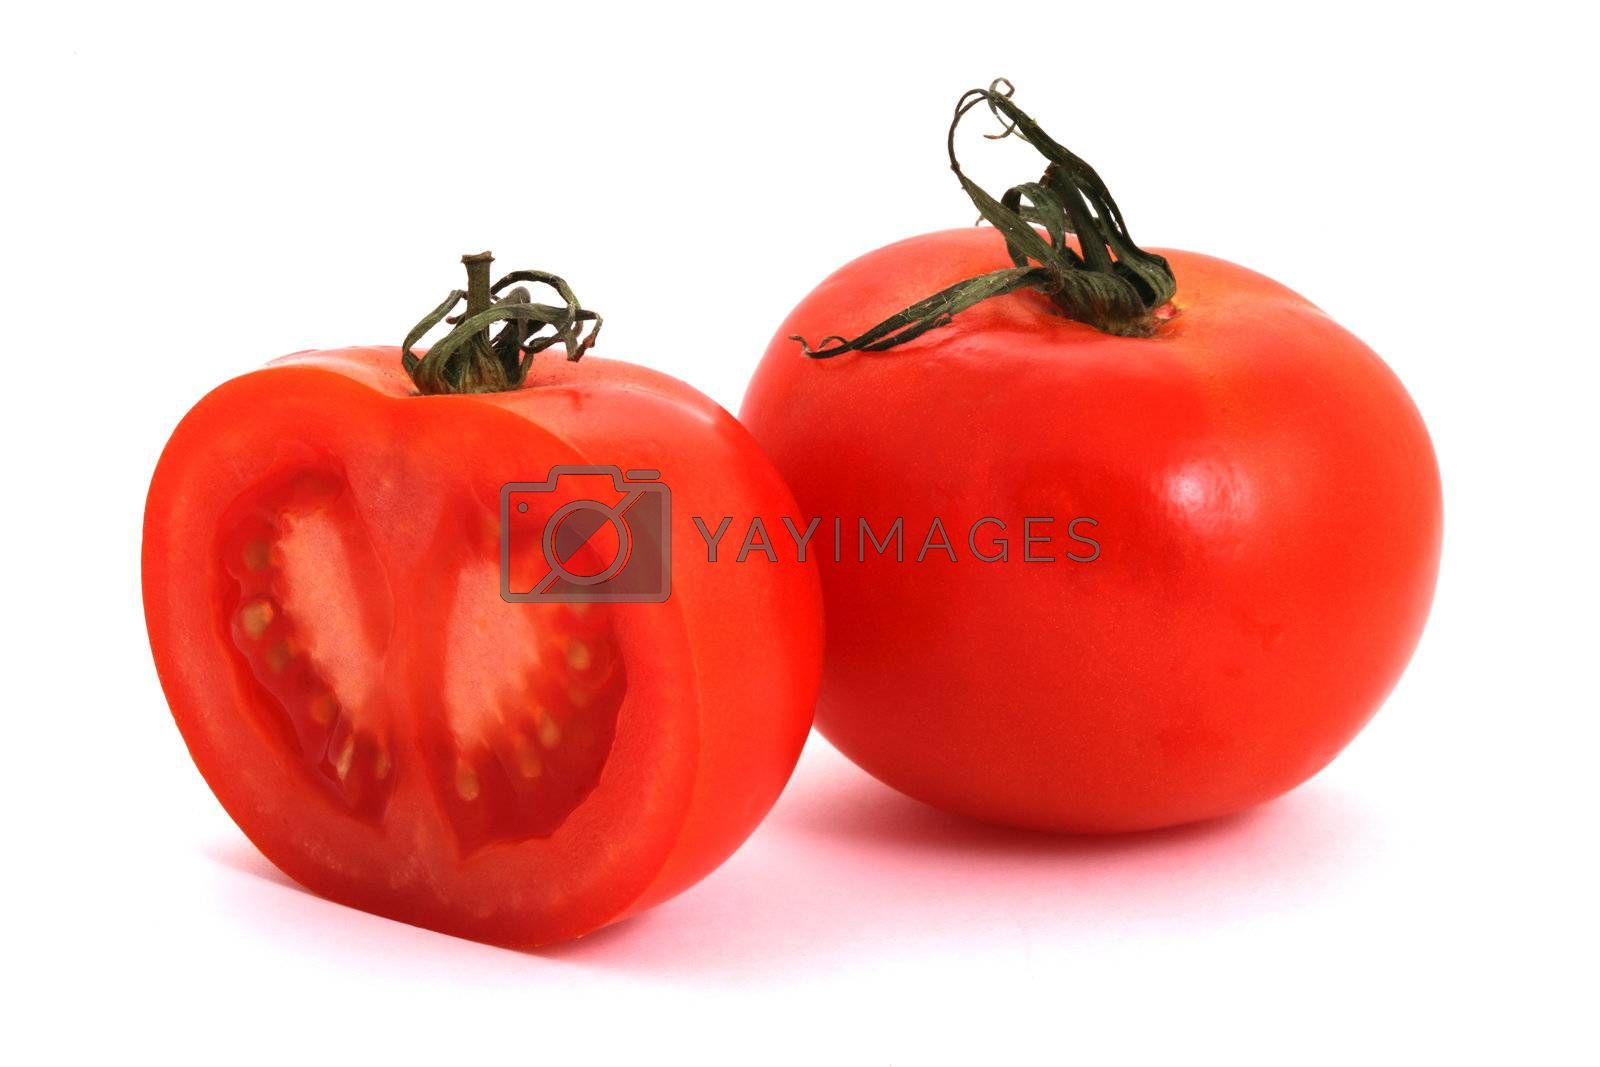 Tomato and half of tomato on a white background